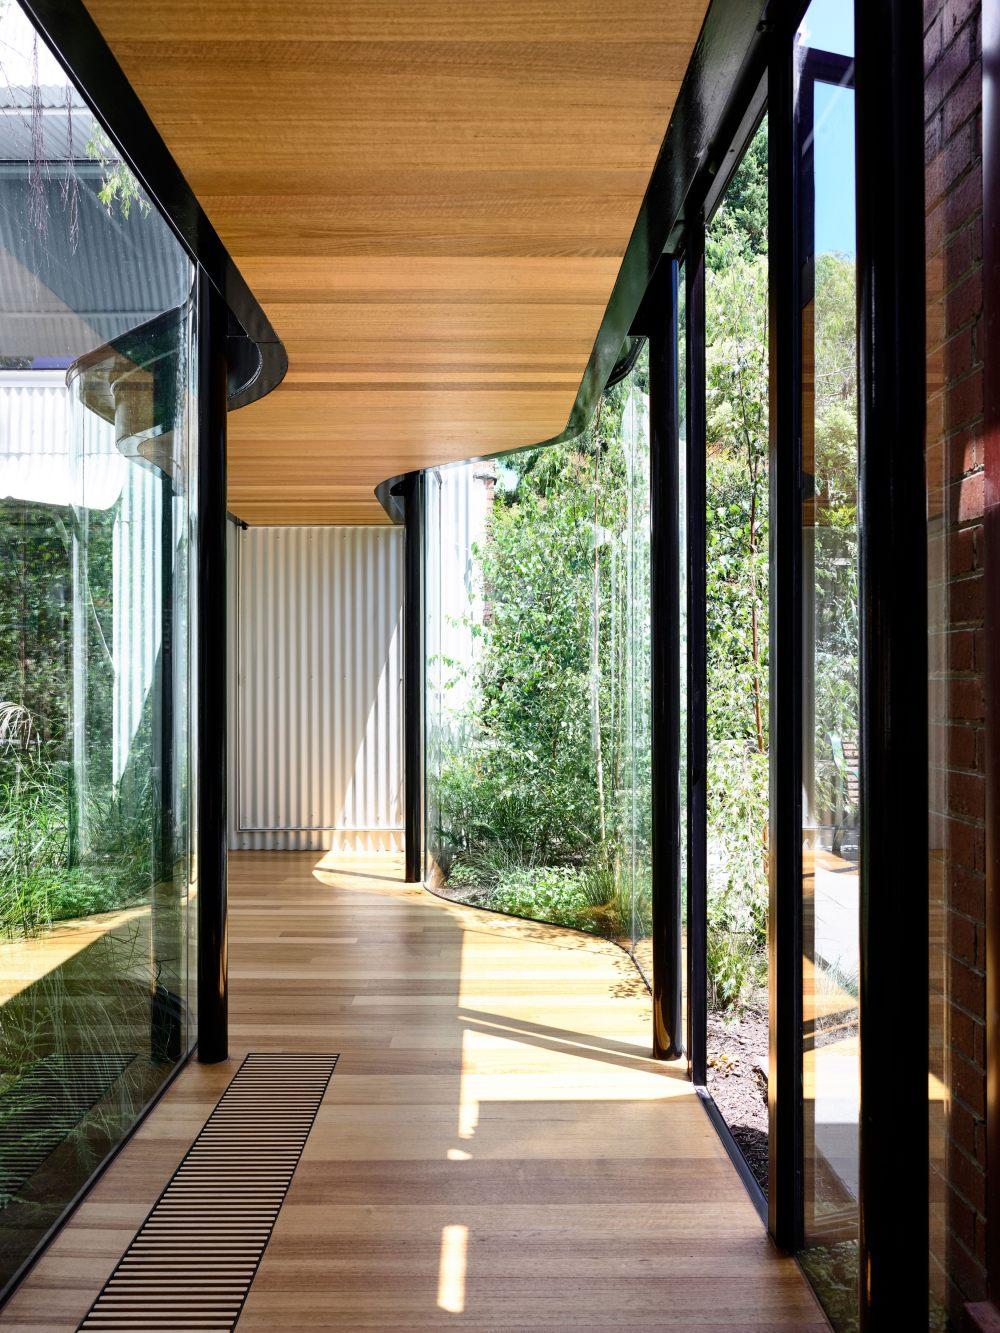 austin_maynard_architects_derek_swalwell_king_bill22.jpg